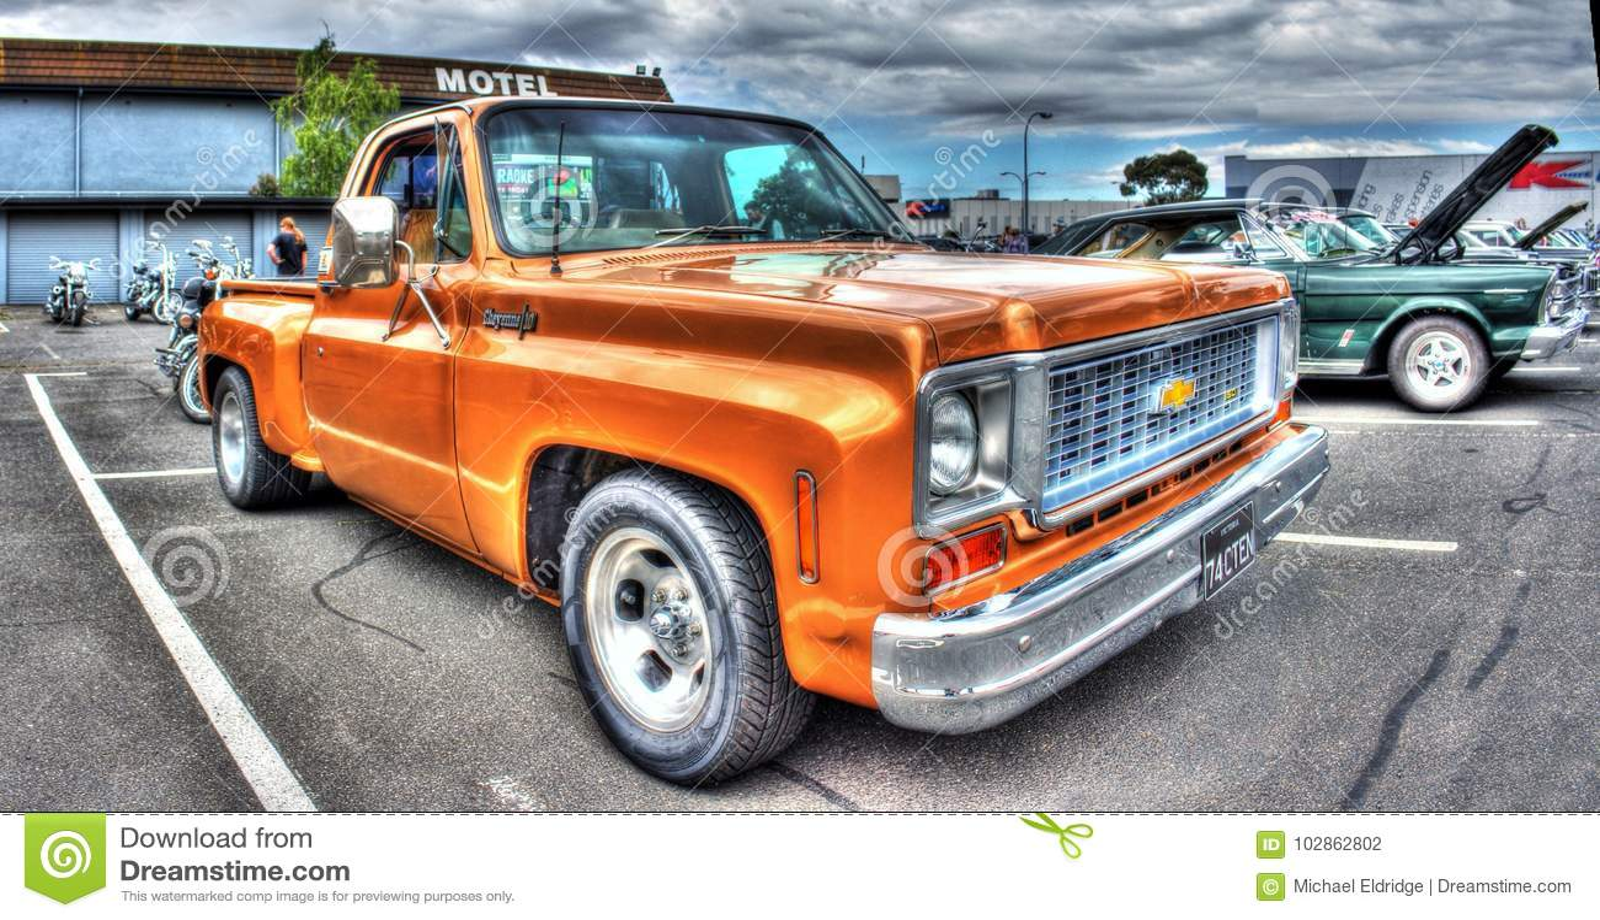 Classic 1970s American Chevy Cheyenne Pickup Truck